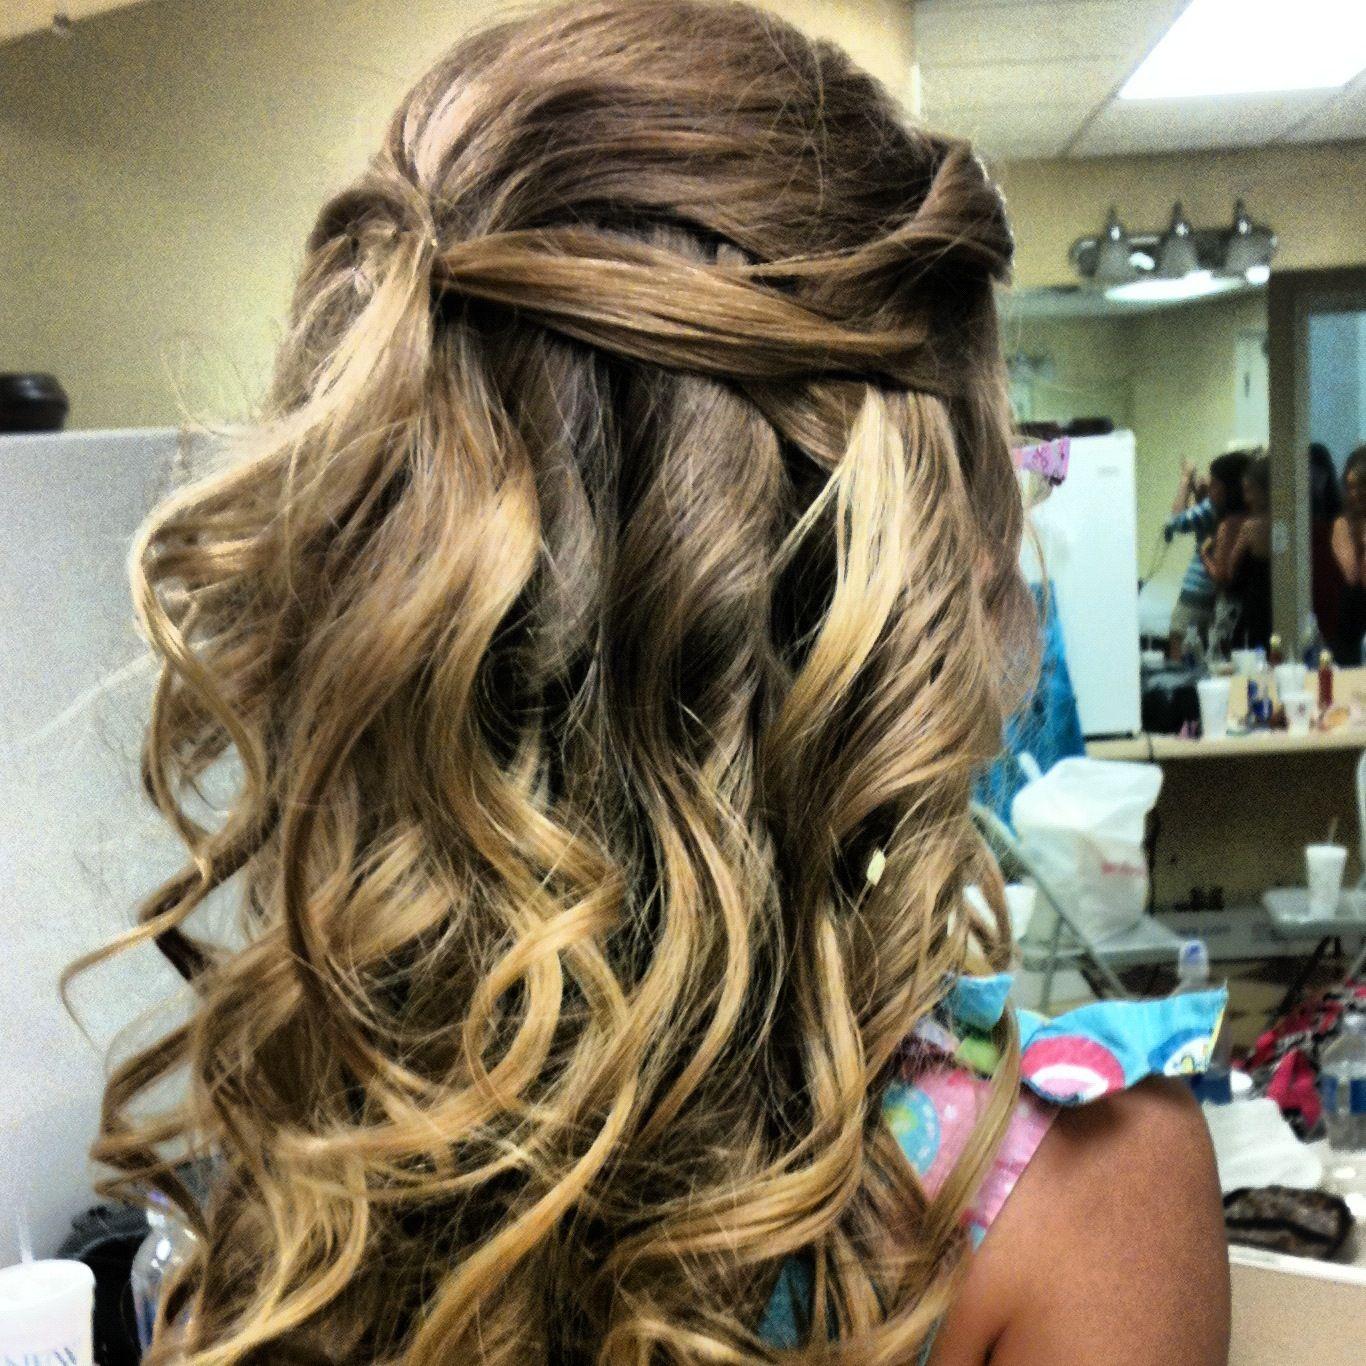 Flower girl hair First Holy munion